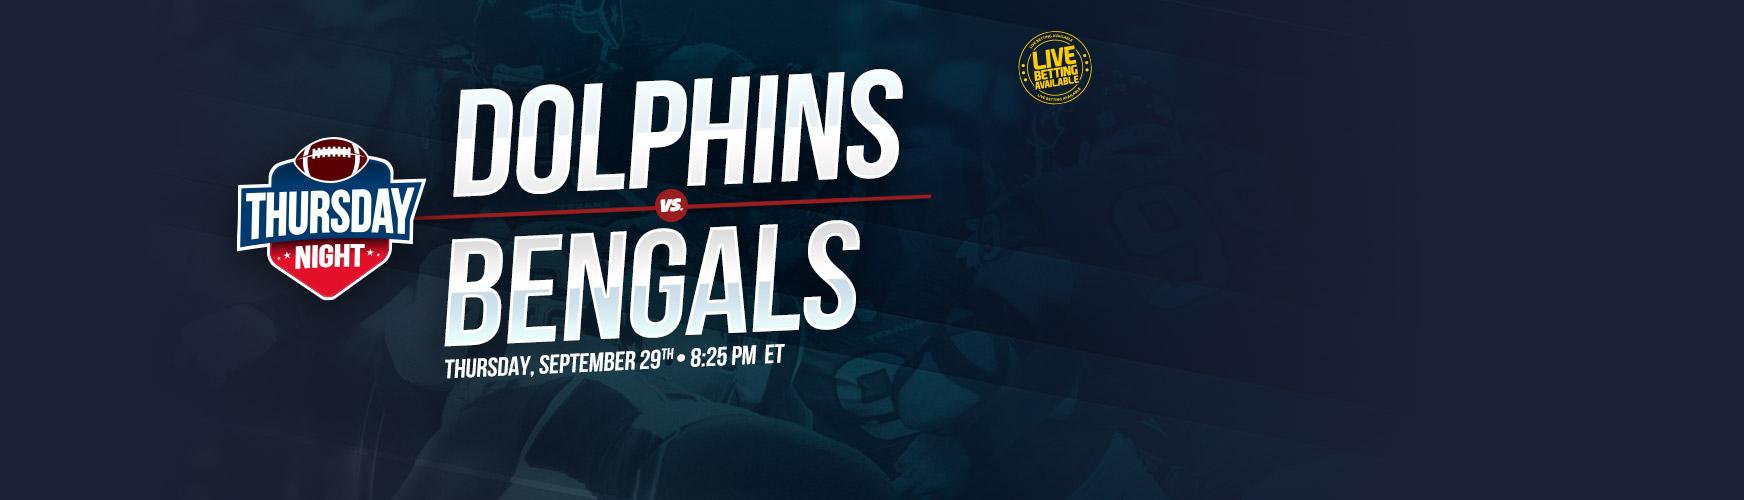 Bet on Dolphins vs Bengals - Thursday Night Football